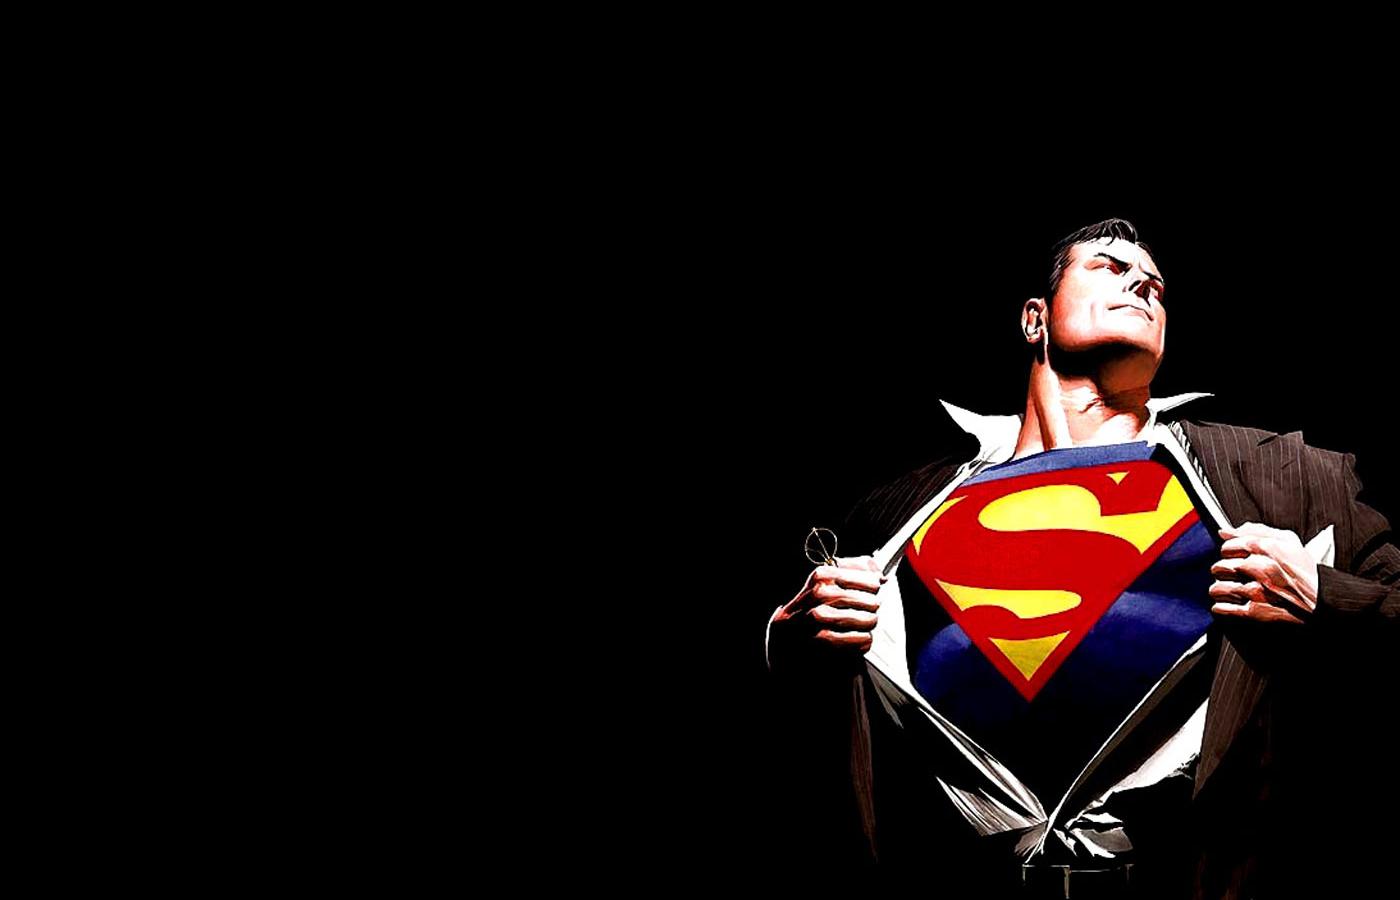 superman alex ross hd wwwpixsharkcom images